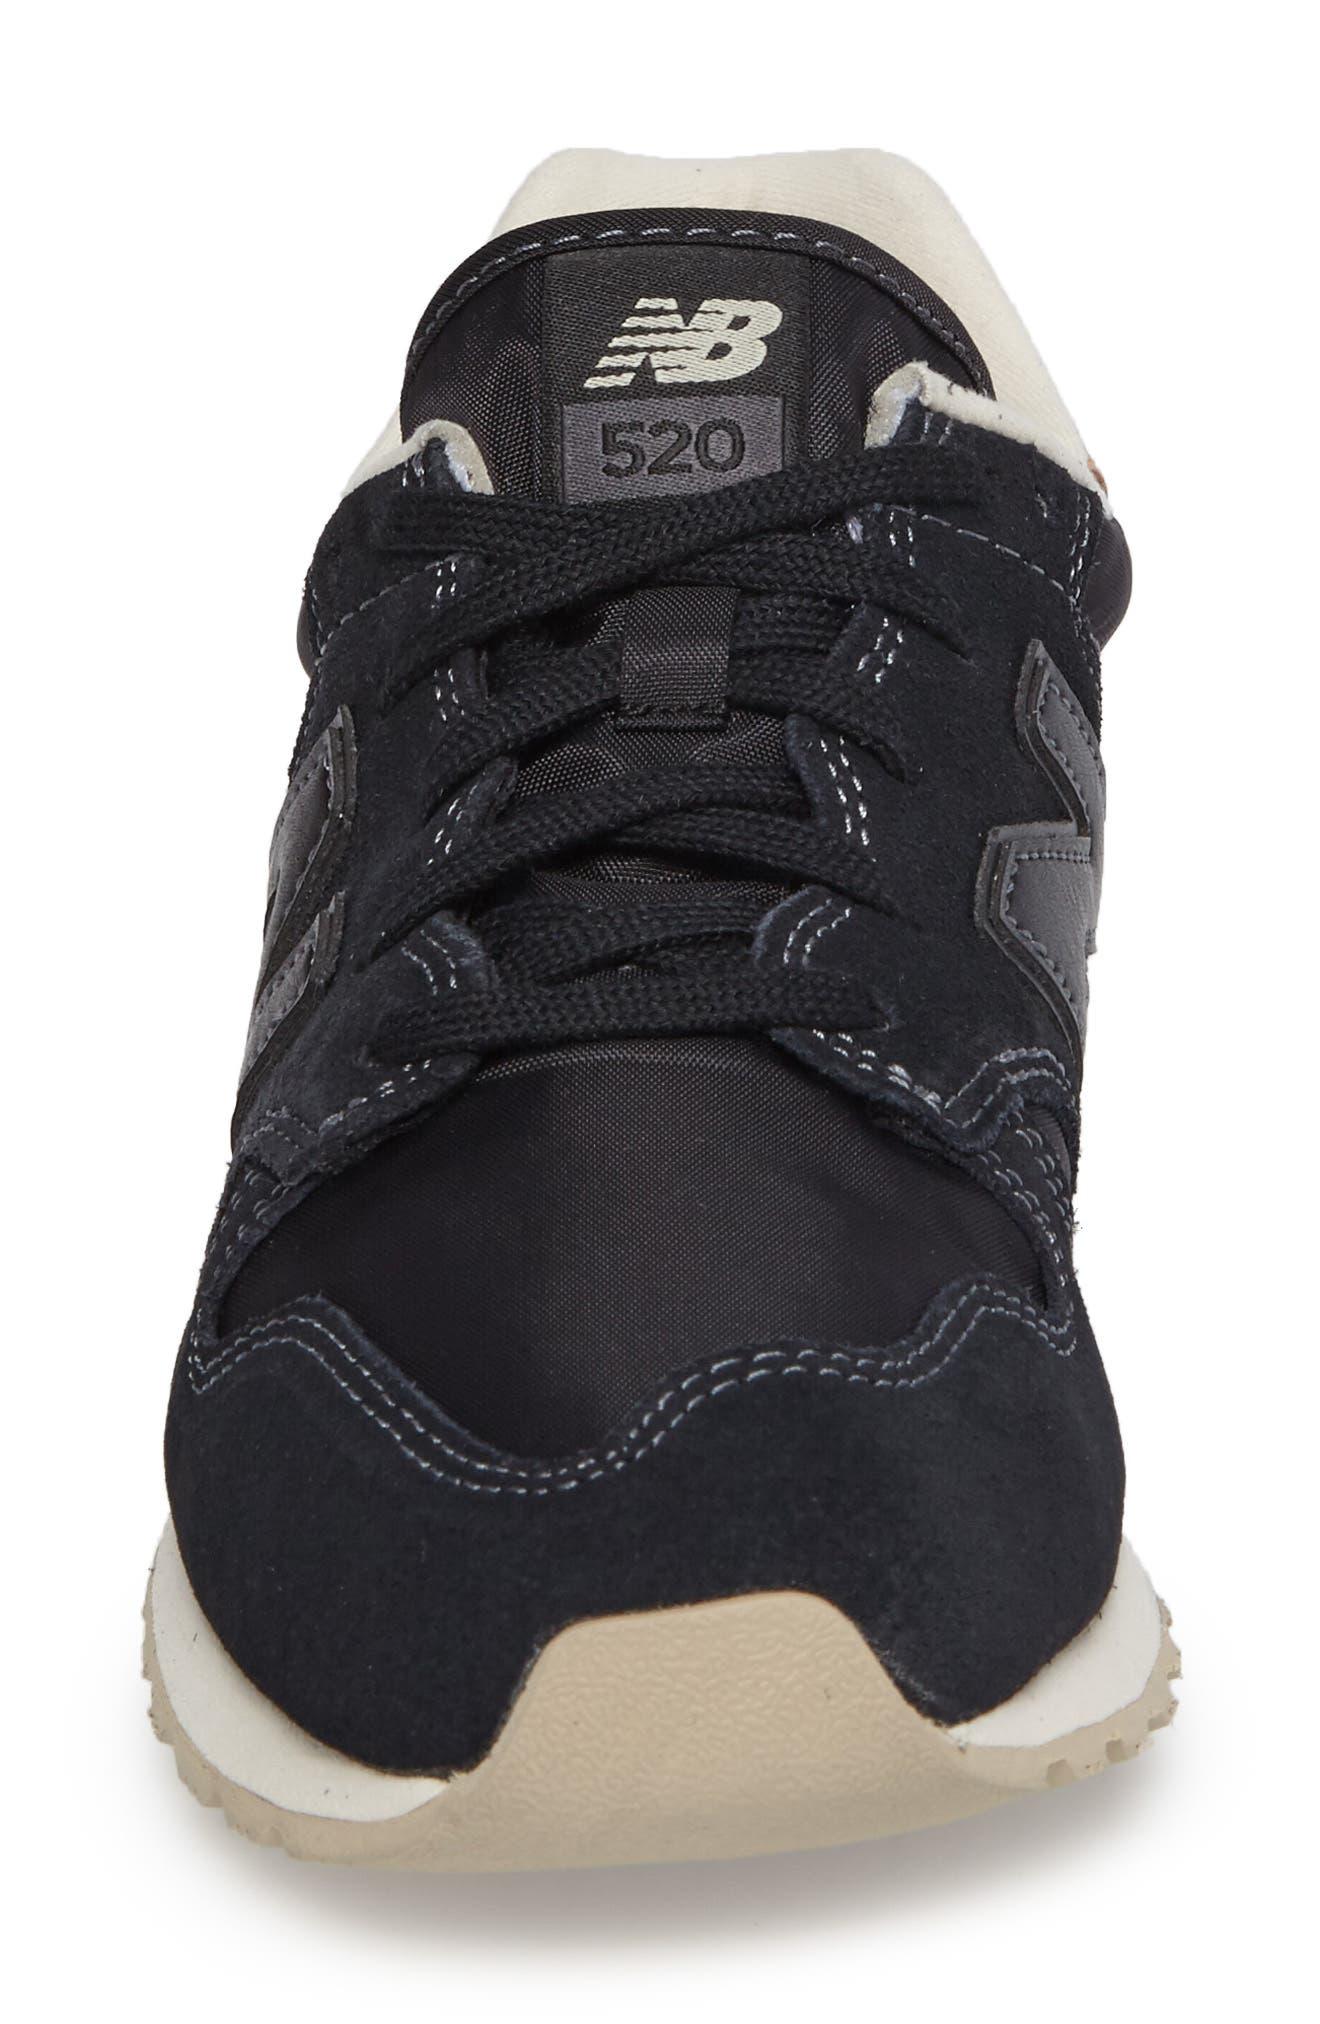 Alternate Image 4  - New Balance 520 Sneaker (Women)